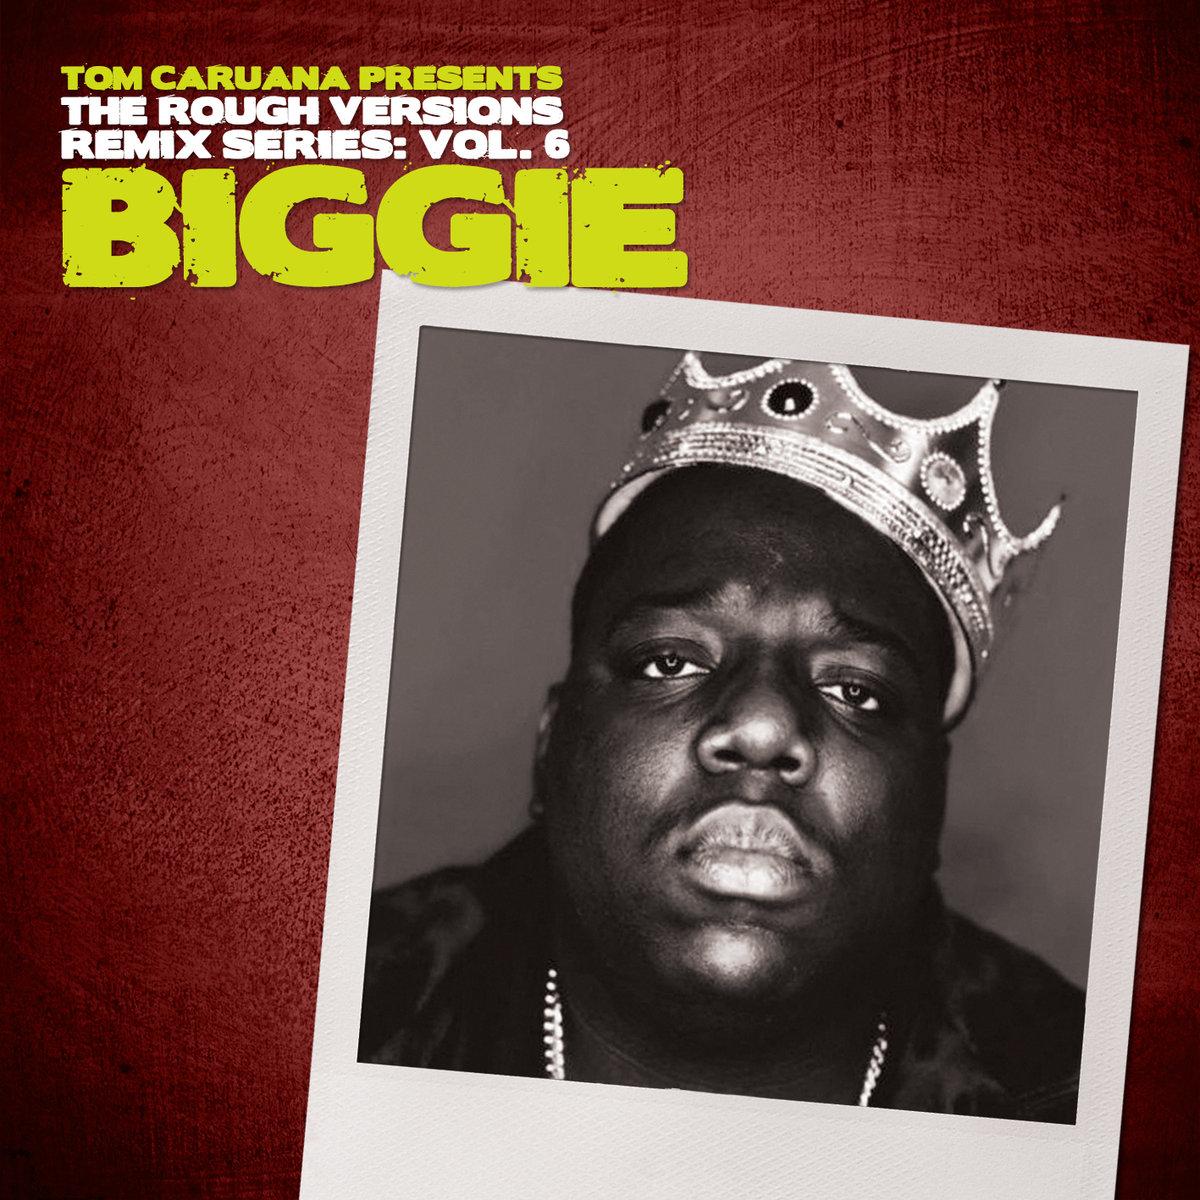 Free Download: Tom Caruana – Rough Versions Vol. 6: Biggie